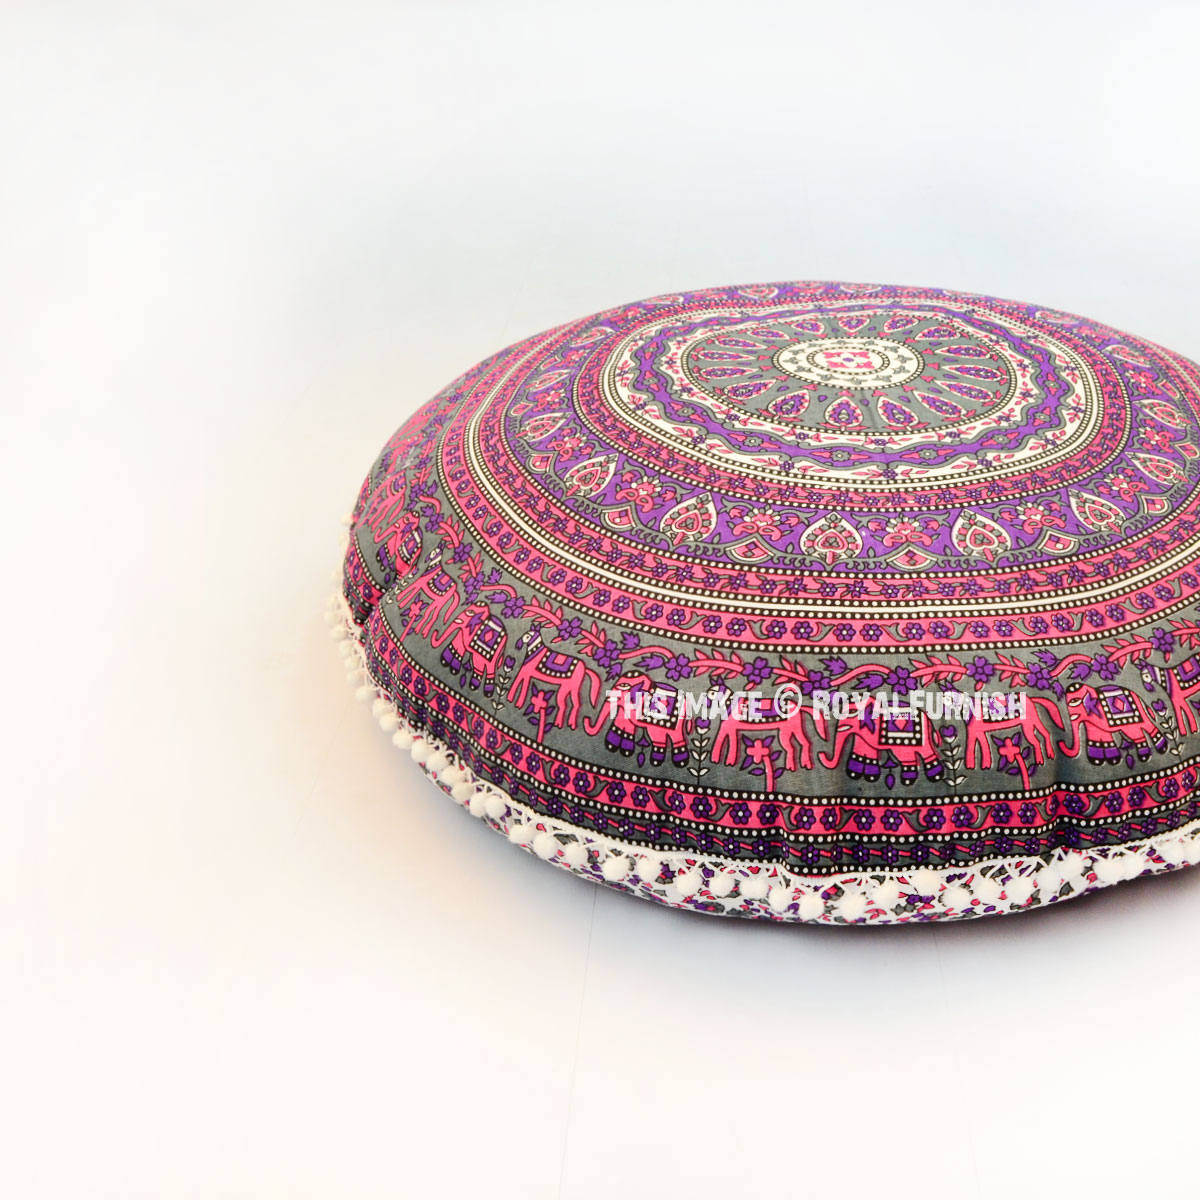 Pink & Grey Elephants Ring Medallion Round Floor Pillow Cover - RoyalFurnish.com